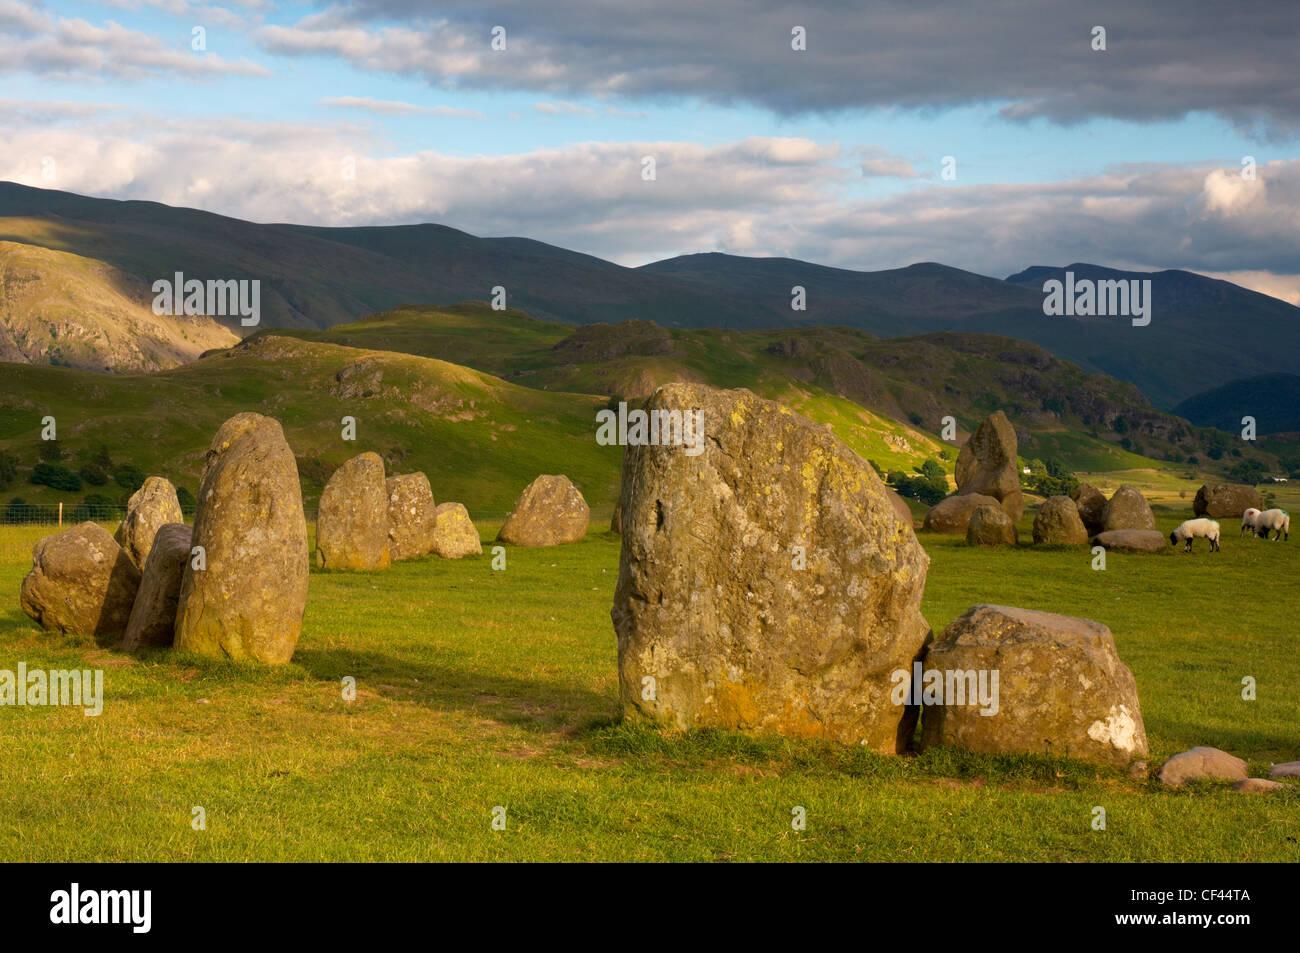 Evening light over Castlerigg stone circle in Cumbria. - Stock Image